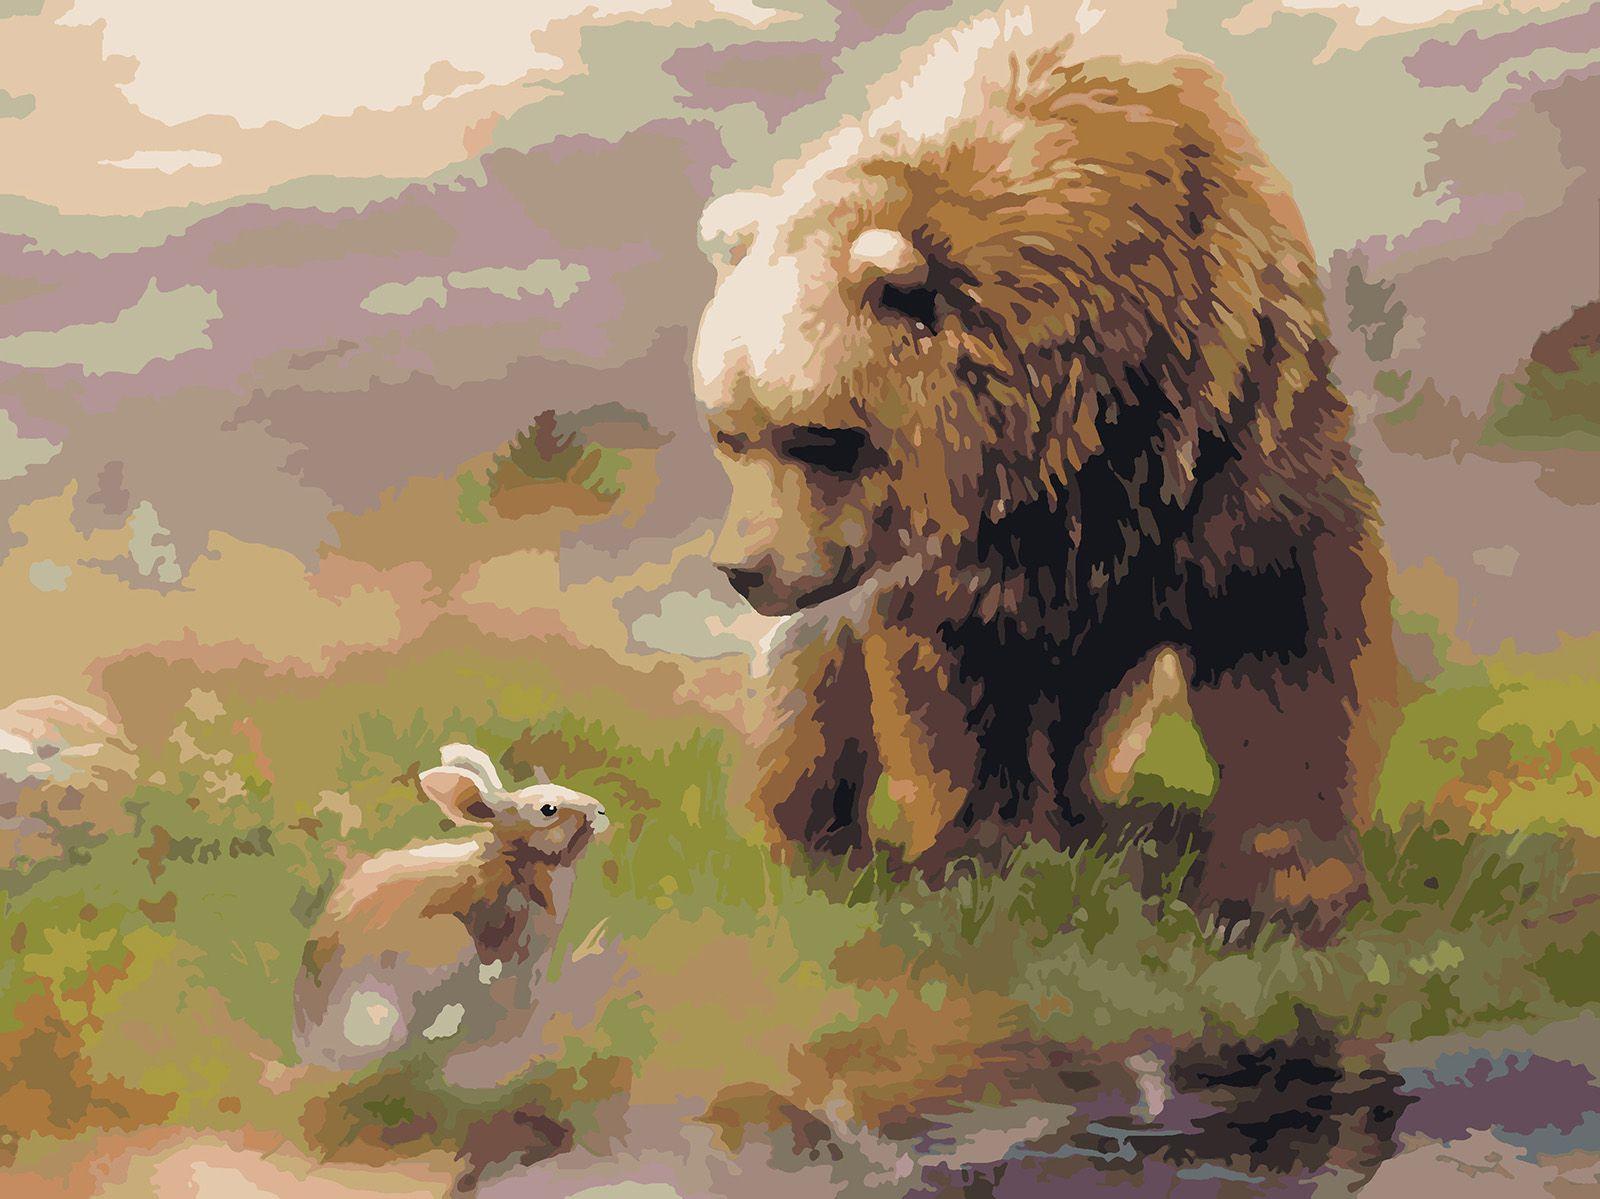 Картина по номерам Красиво Красим Заяц и Медведь, 40 х 50 см